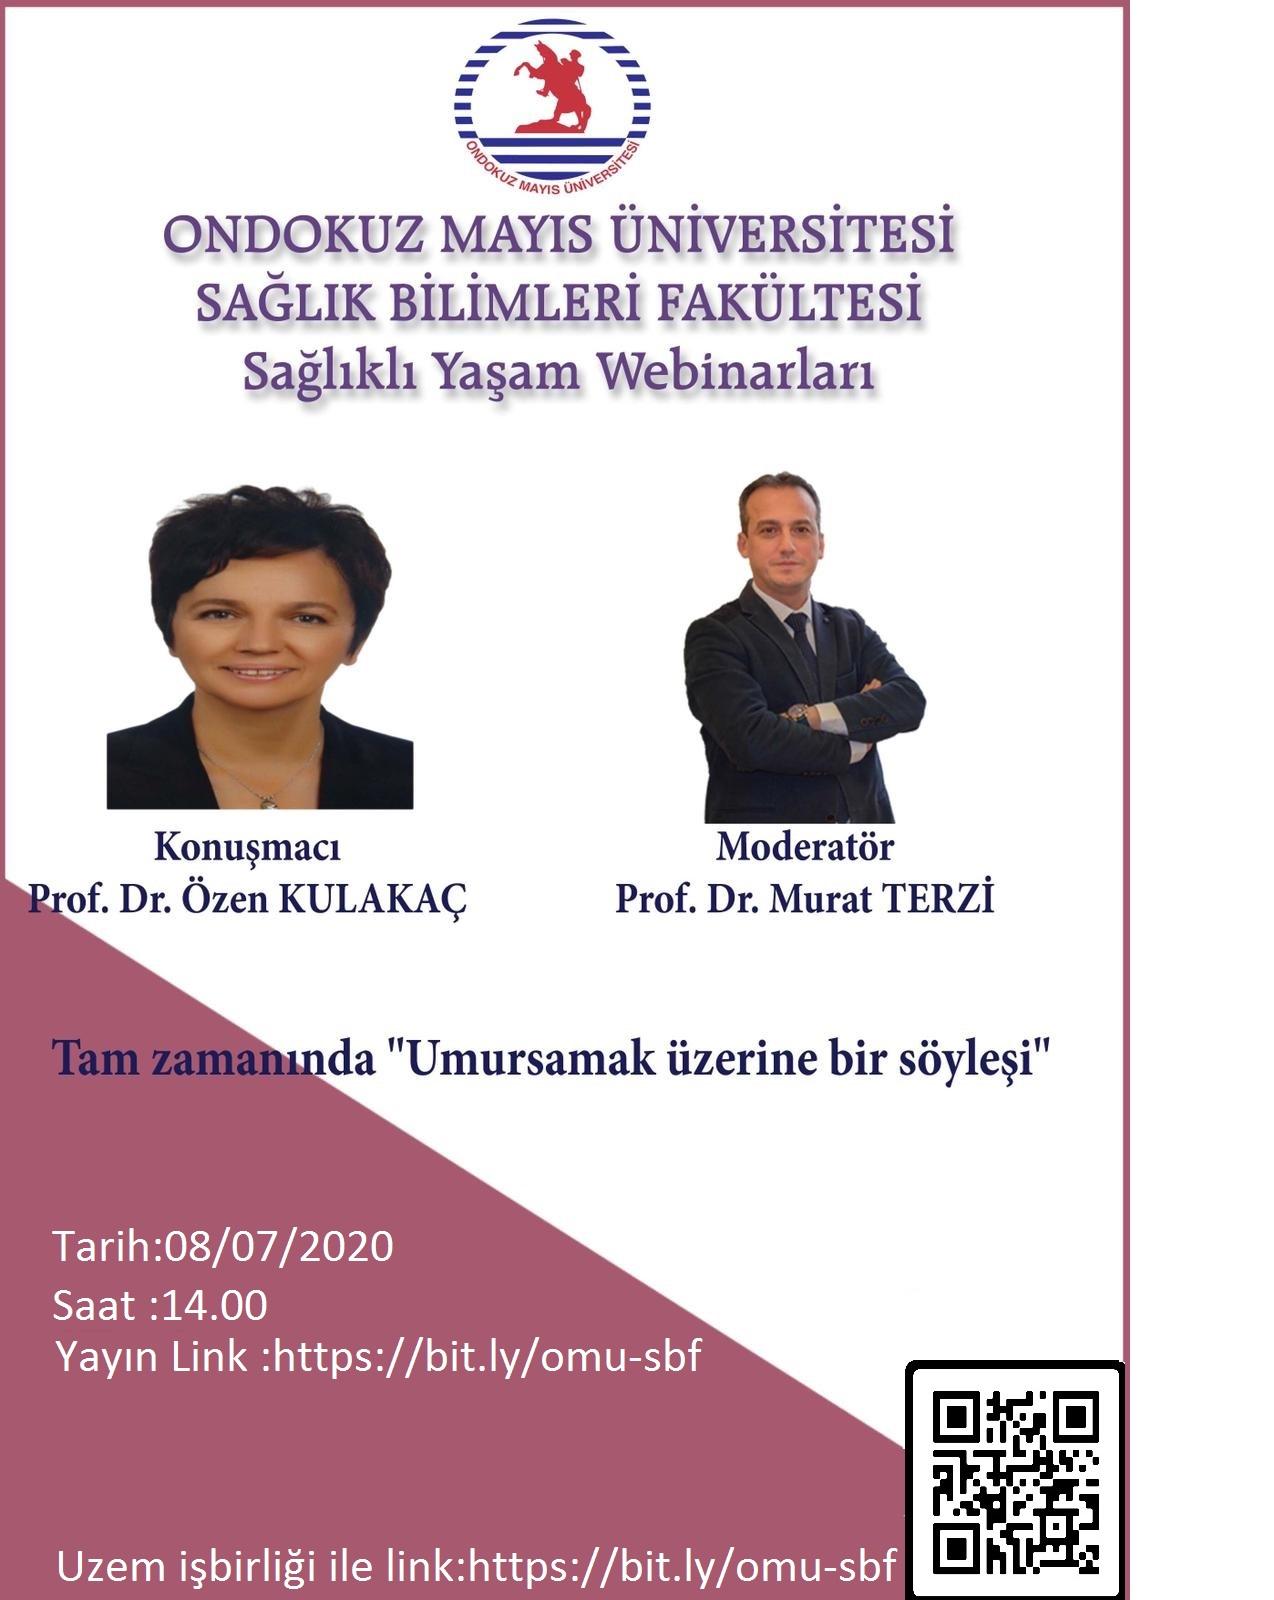 https://www.omu.edu.tr/sites/default/files/omu_saglikli_yasam_webinarlari.jpg